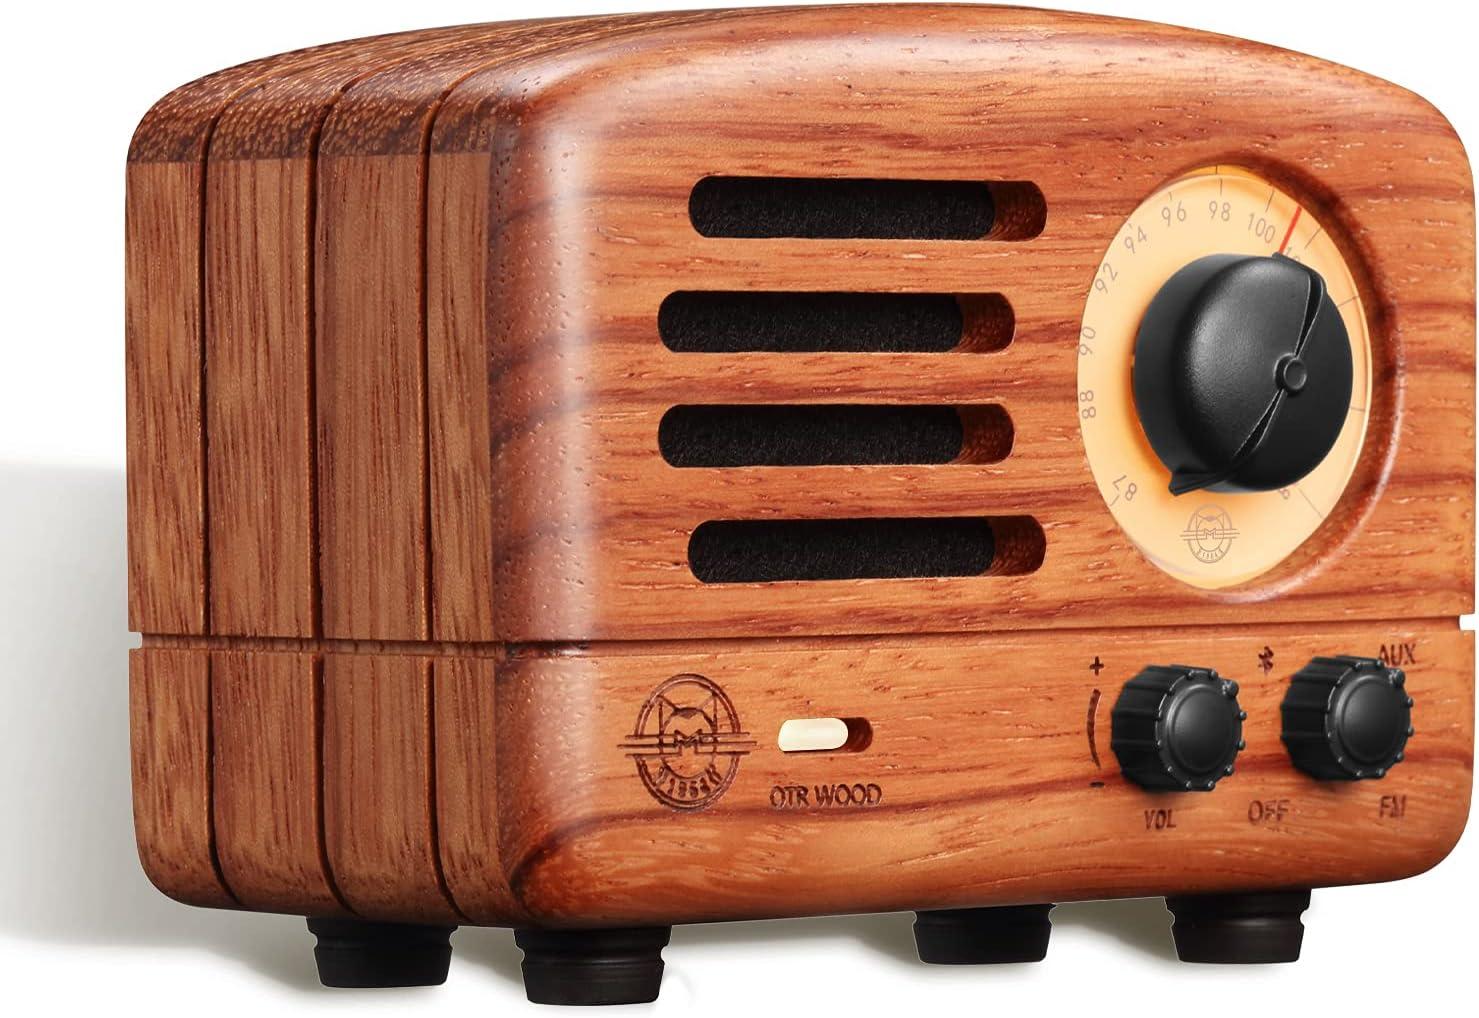 Bluetooth Speaker, MUZEN Transistor AM FM Radio, Portable Bluetooth Speaker, Loud Volume, Stereo Sound, Retro Old Fashion Design, Wireless Speaker with FM/AUX Radio Function for Home, Office, Outdoor